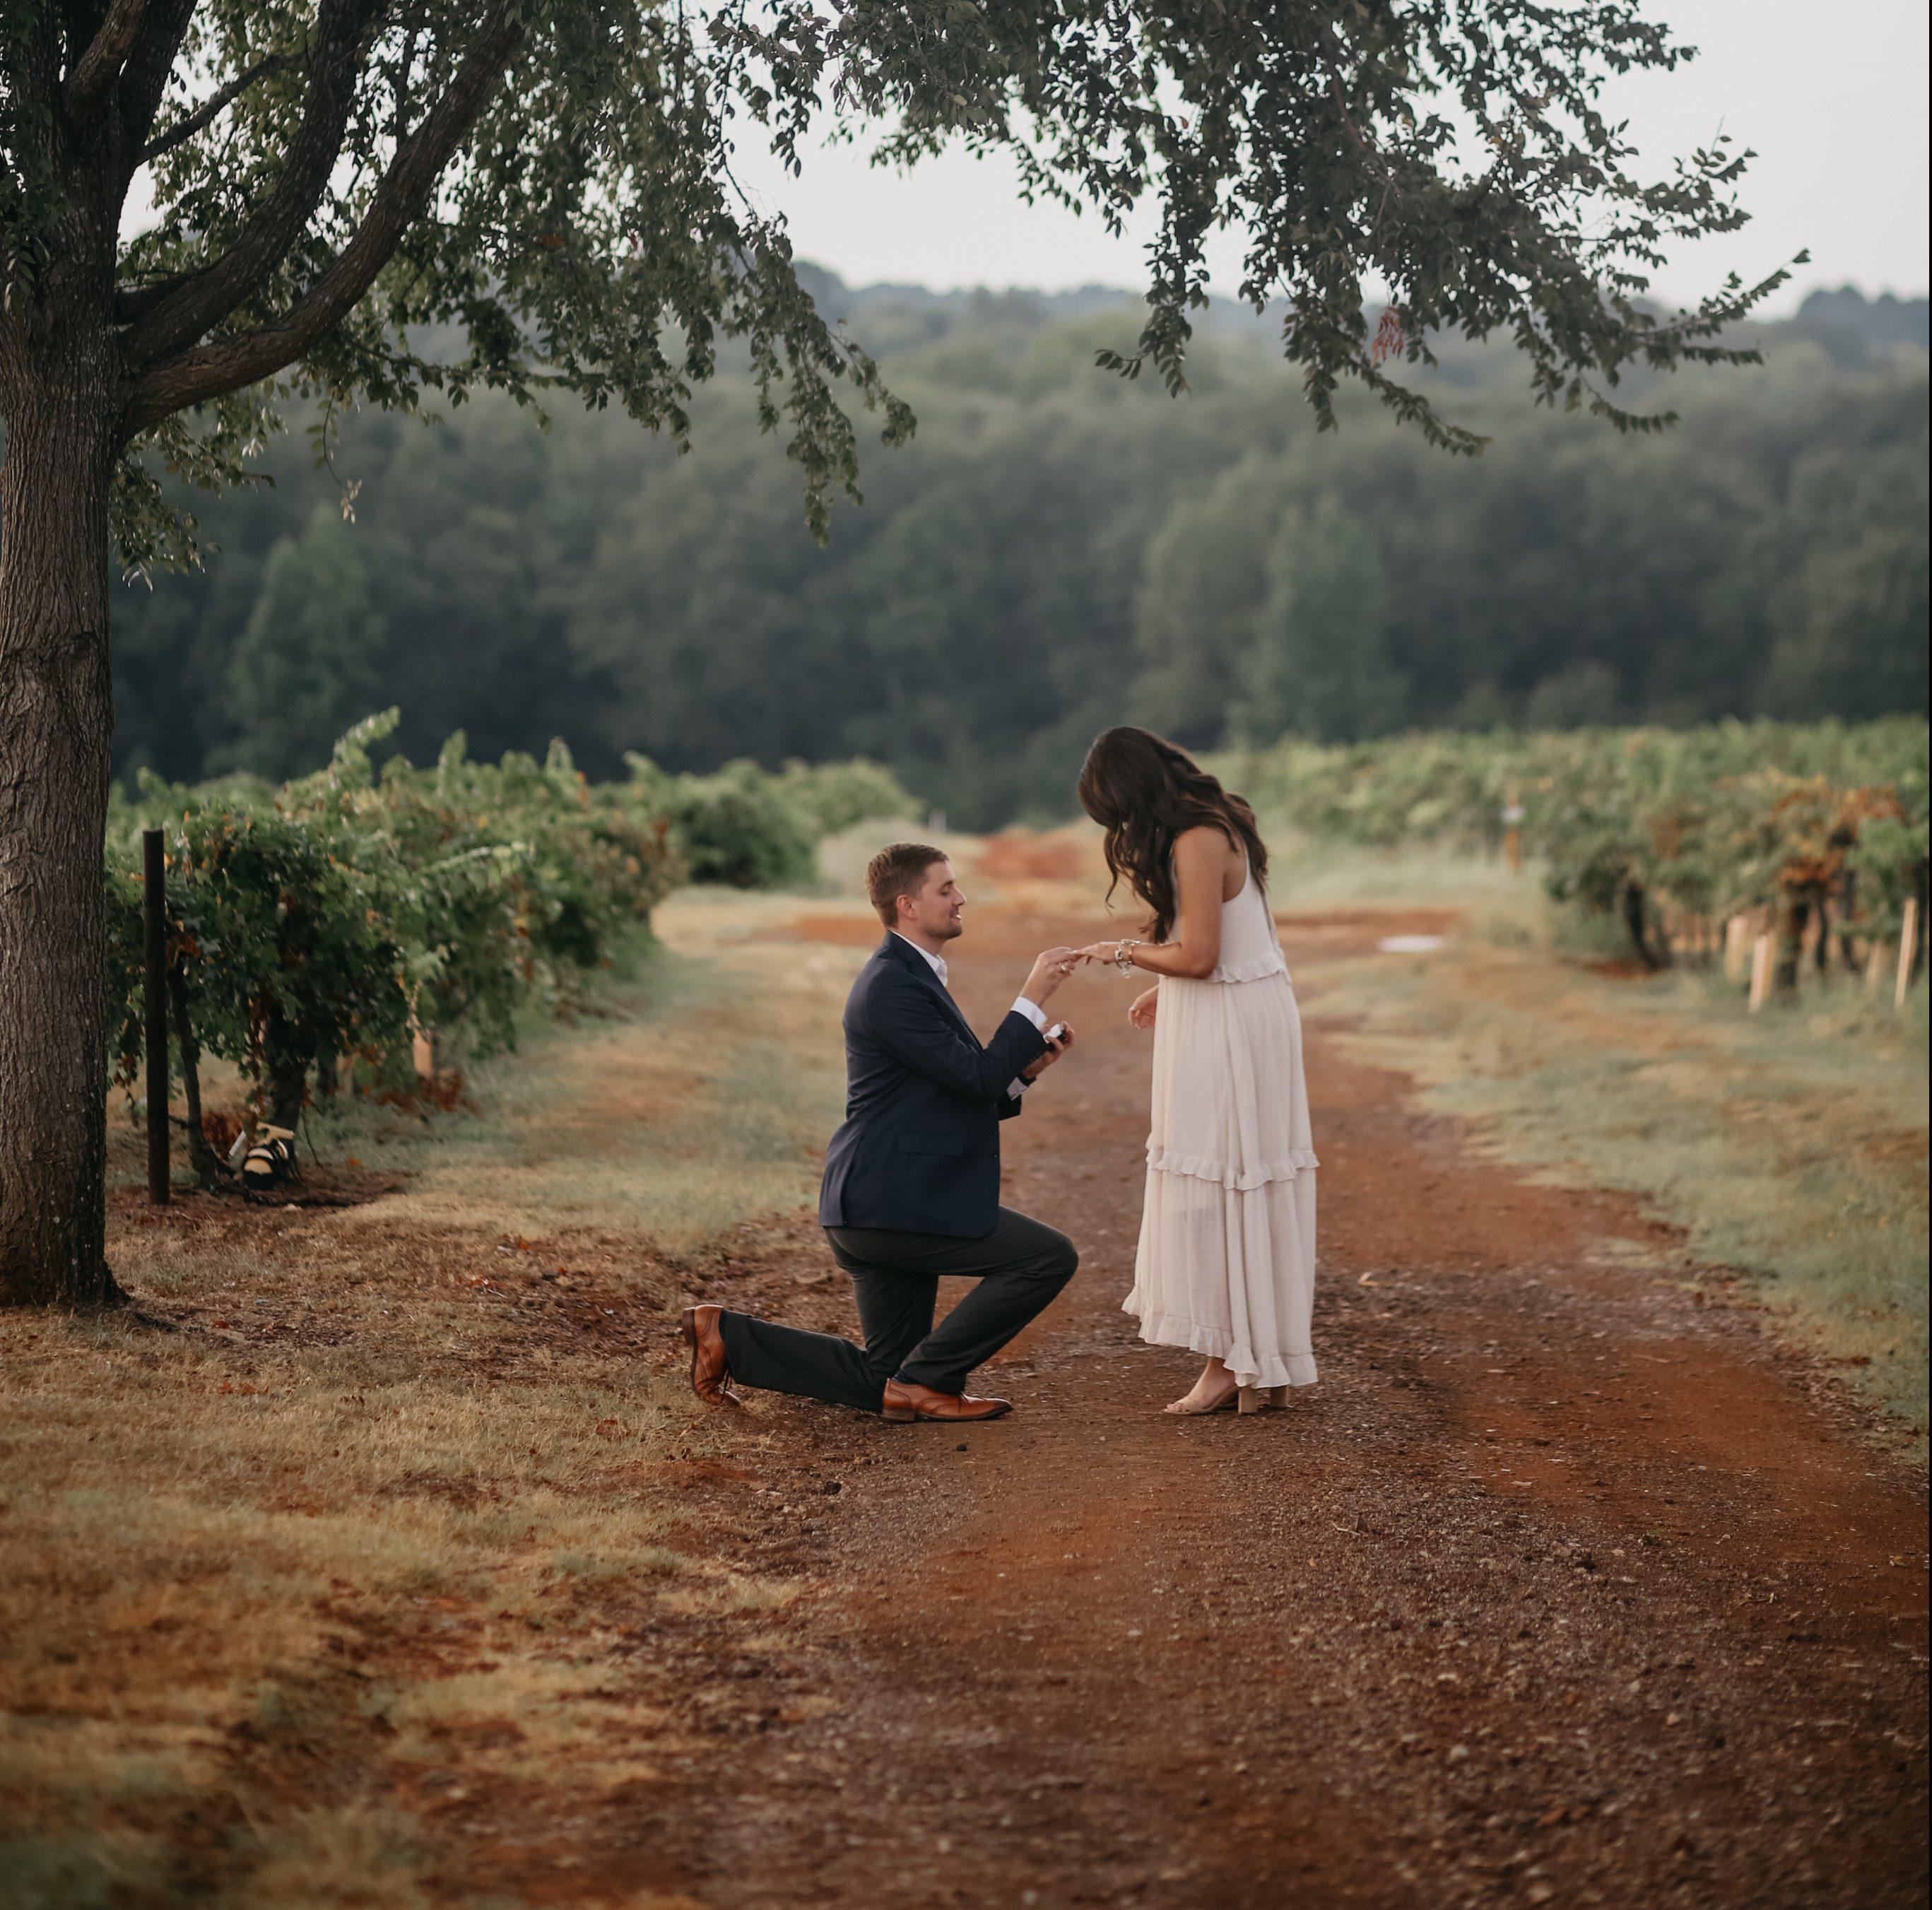 Madison's Proposal in Kiepersol Winery